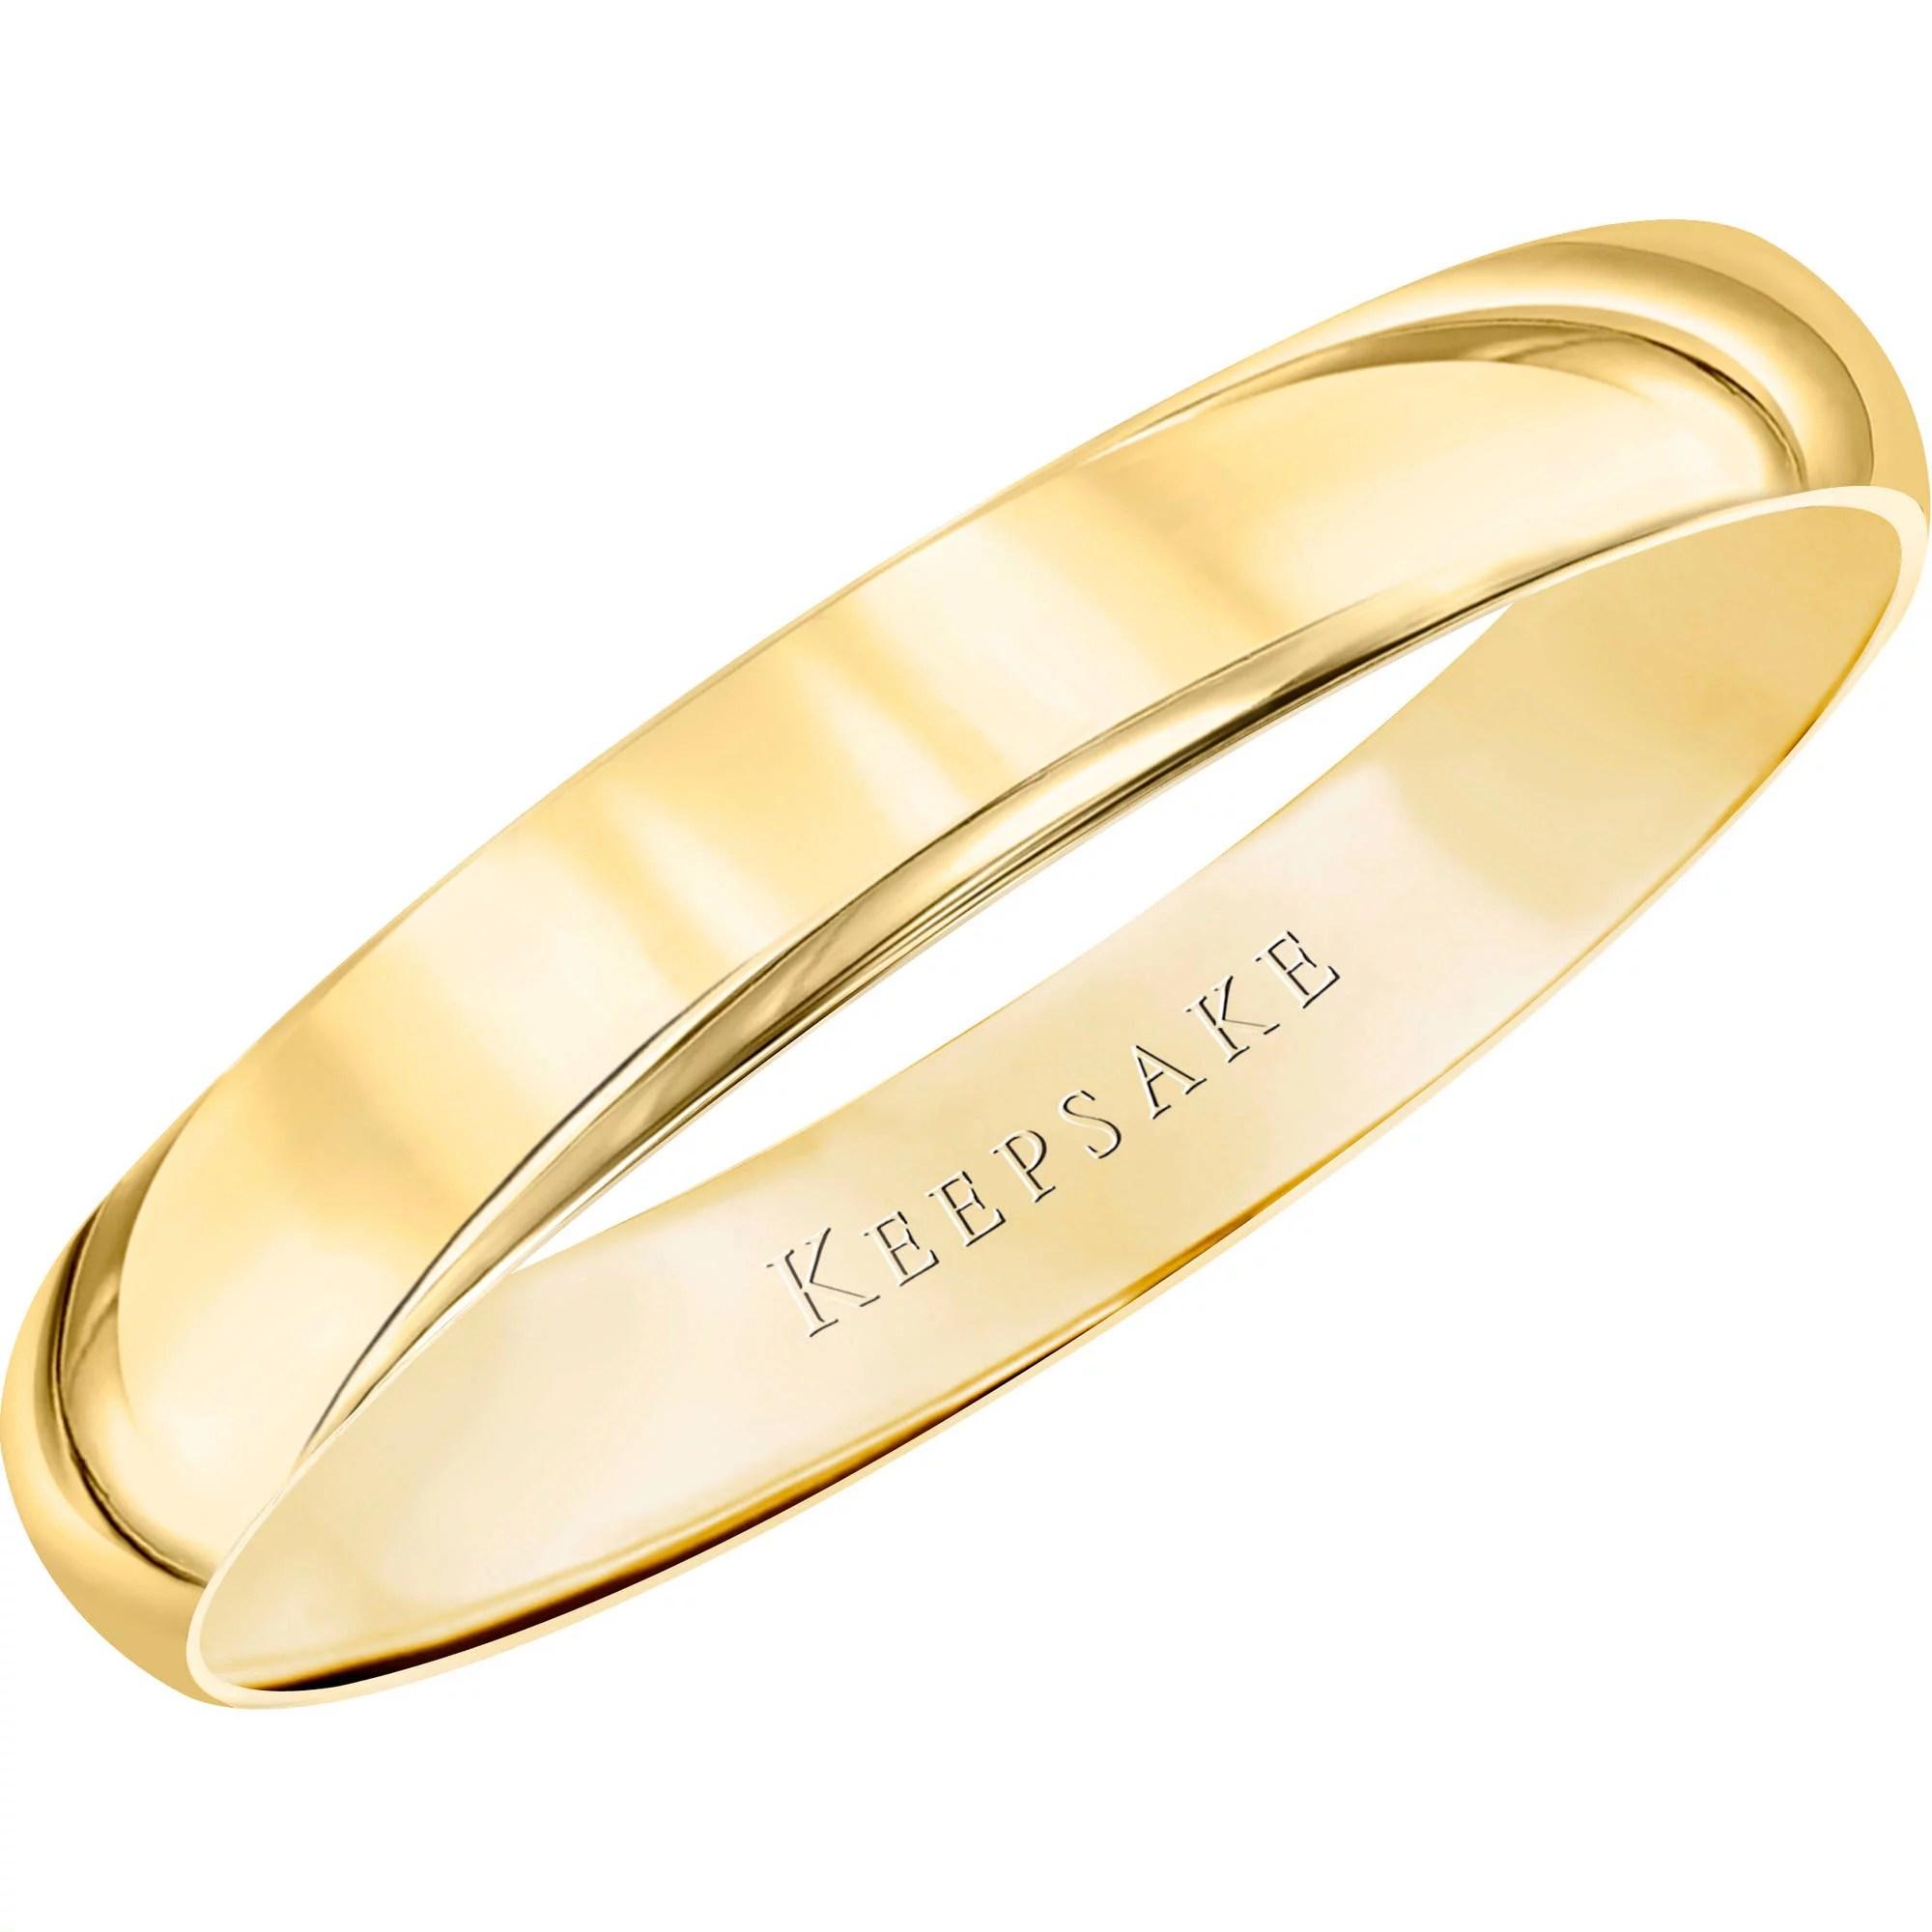 gold wedding bands Keepsake 10kt Yellow Gold Wedding Band With High Polish Finish 3mm